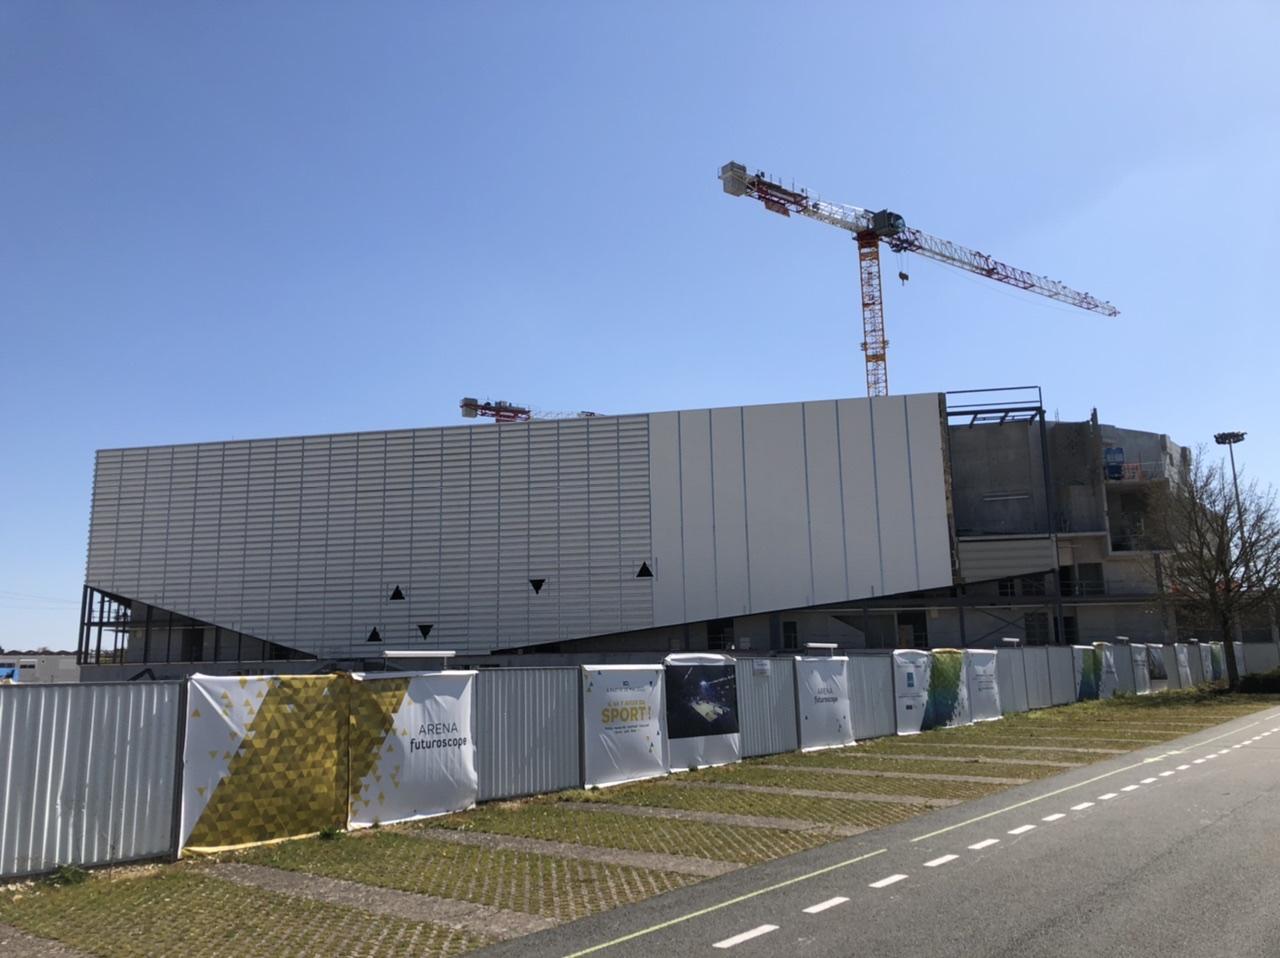 « Arena Futuroscope » grande salle de spectacles et de sports · 2022 - Page 17 ABD93572-EDDB-4877-A09-B-950-E570-FC7-C5